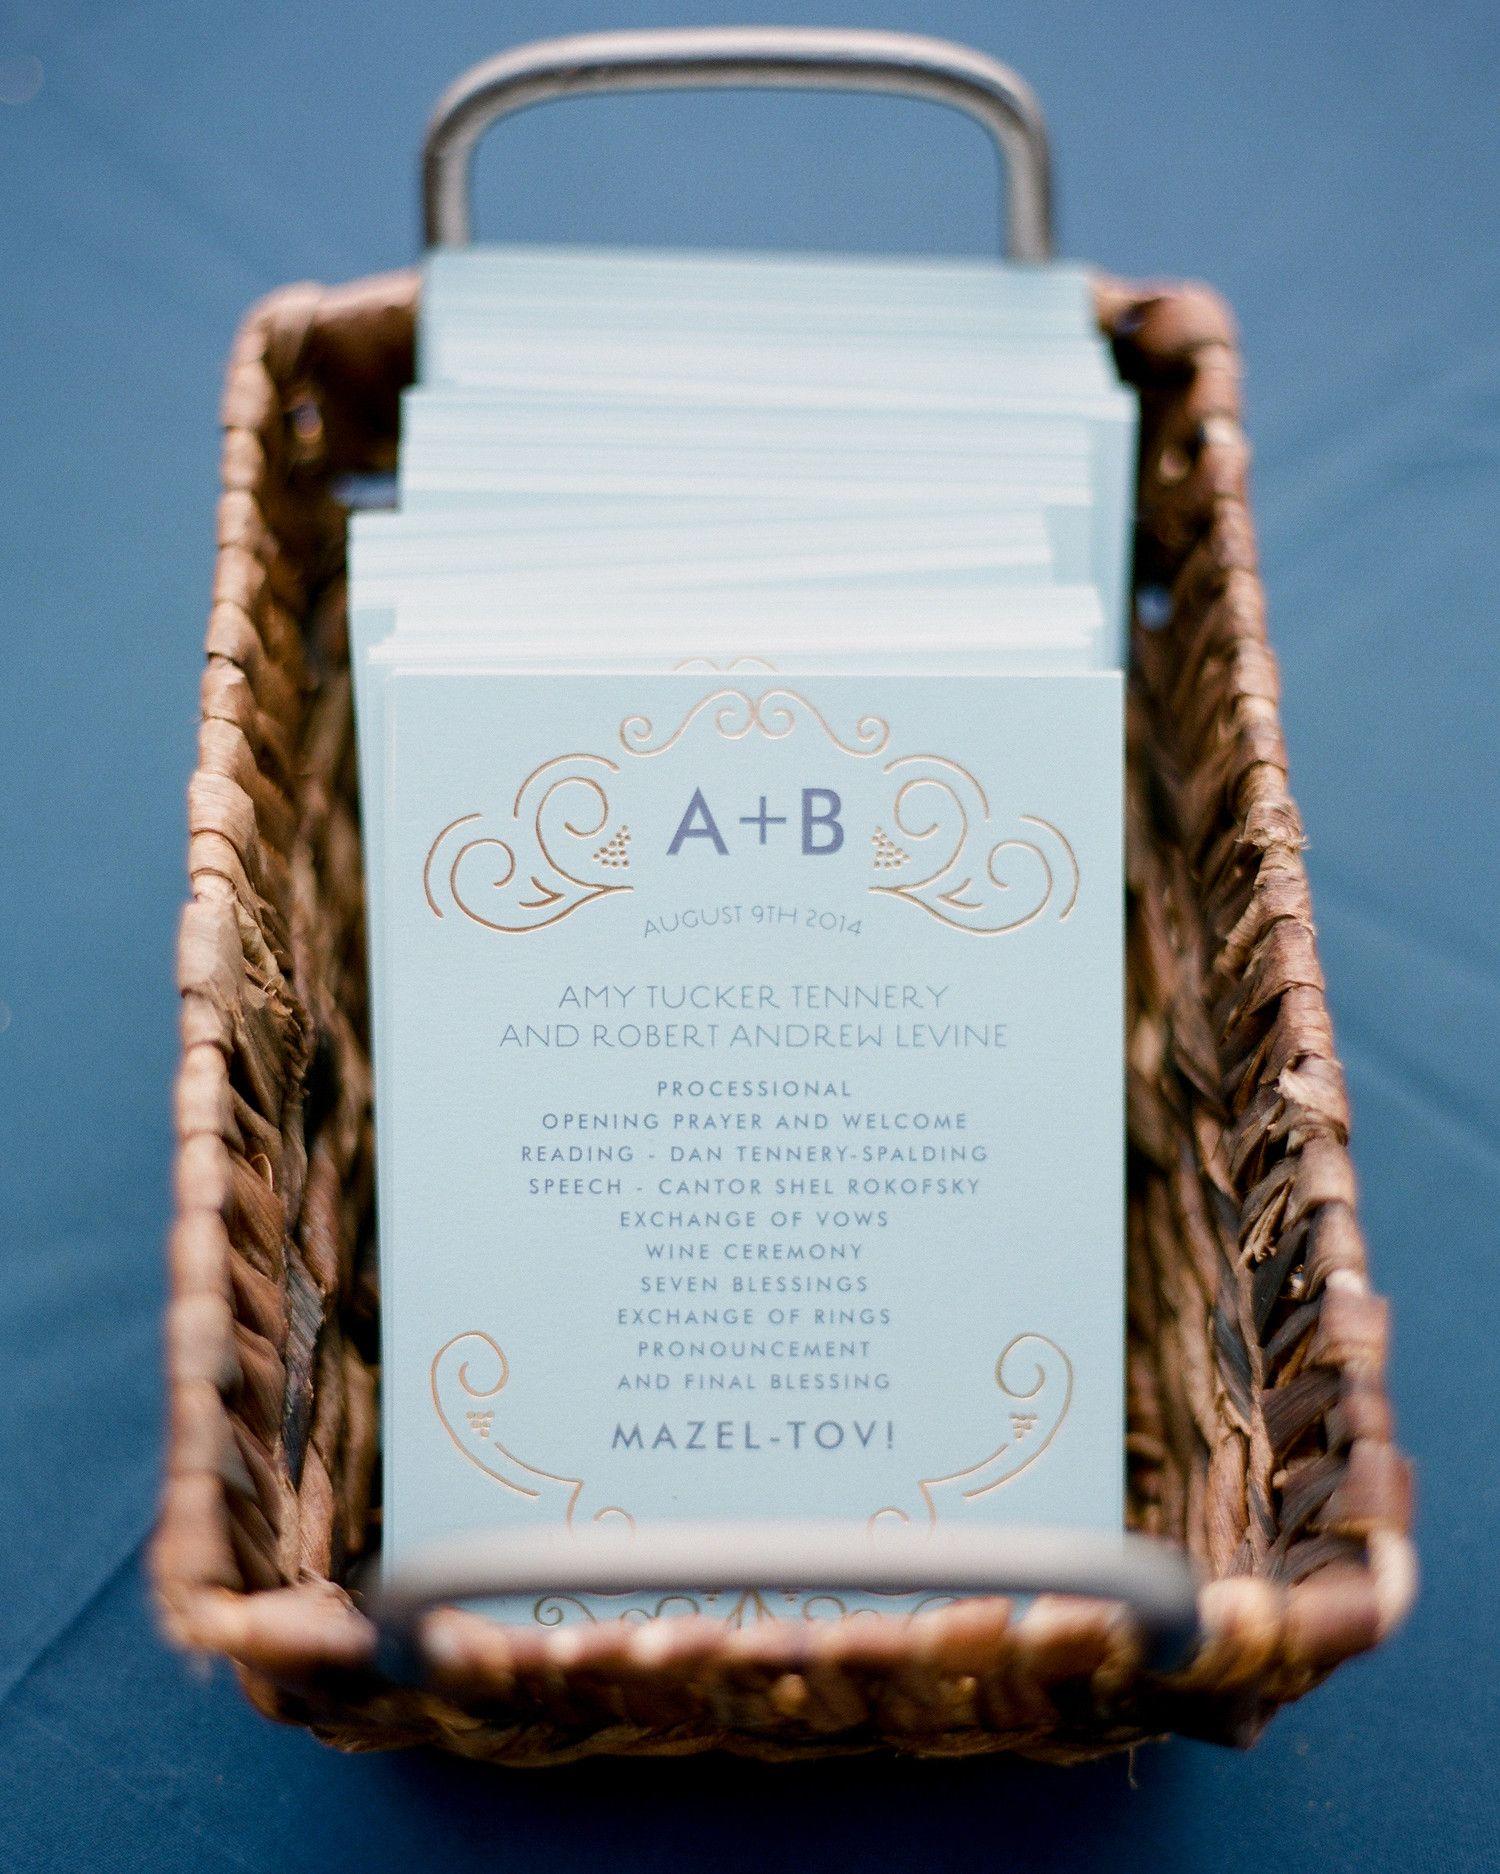 44 Perfect Wedding Ceremony Programs | Wedding programs, Wedding ...